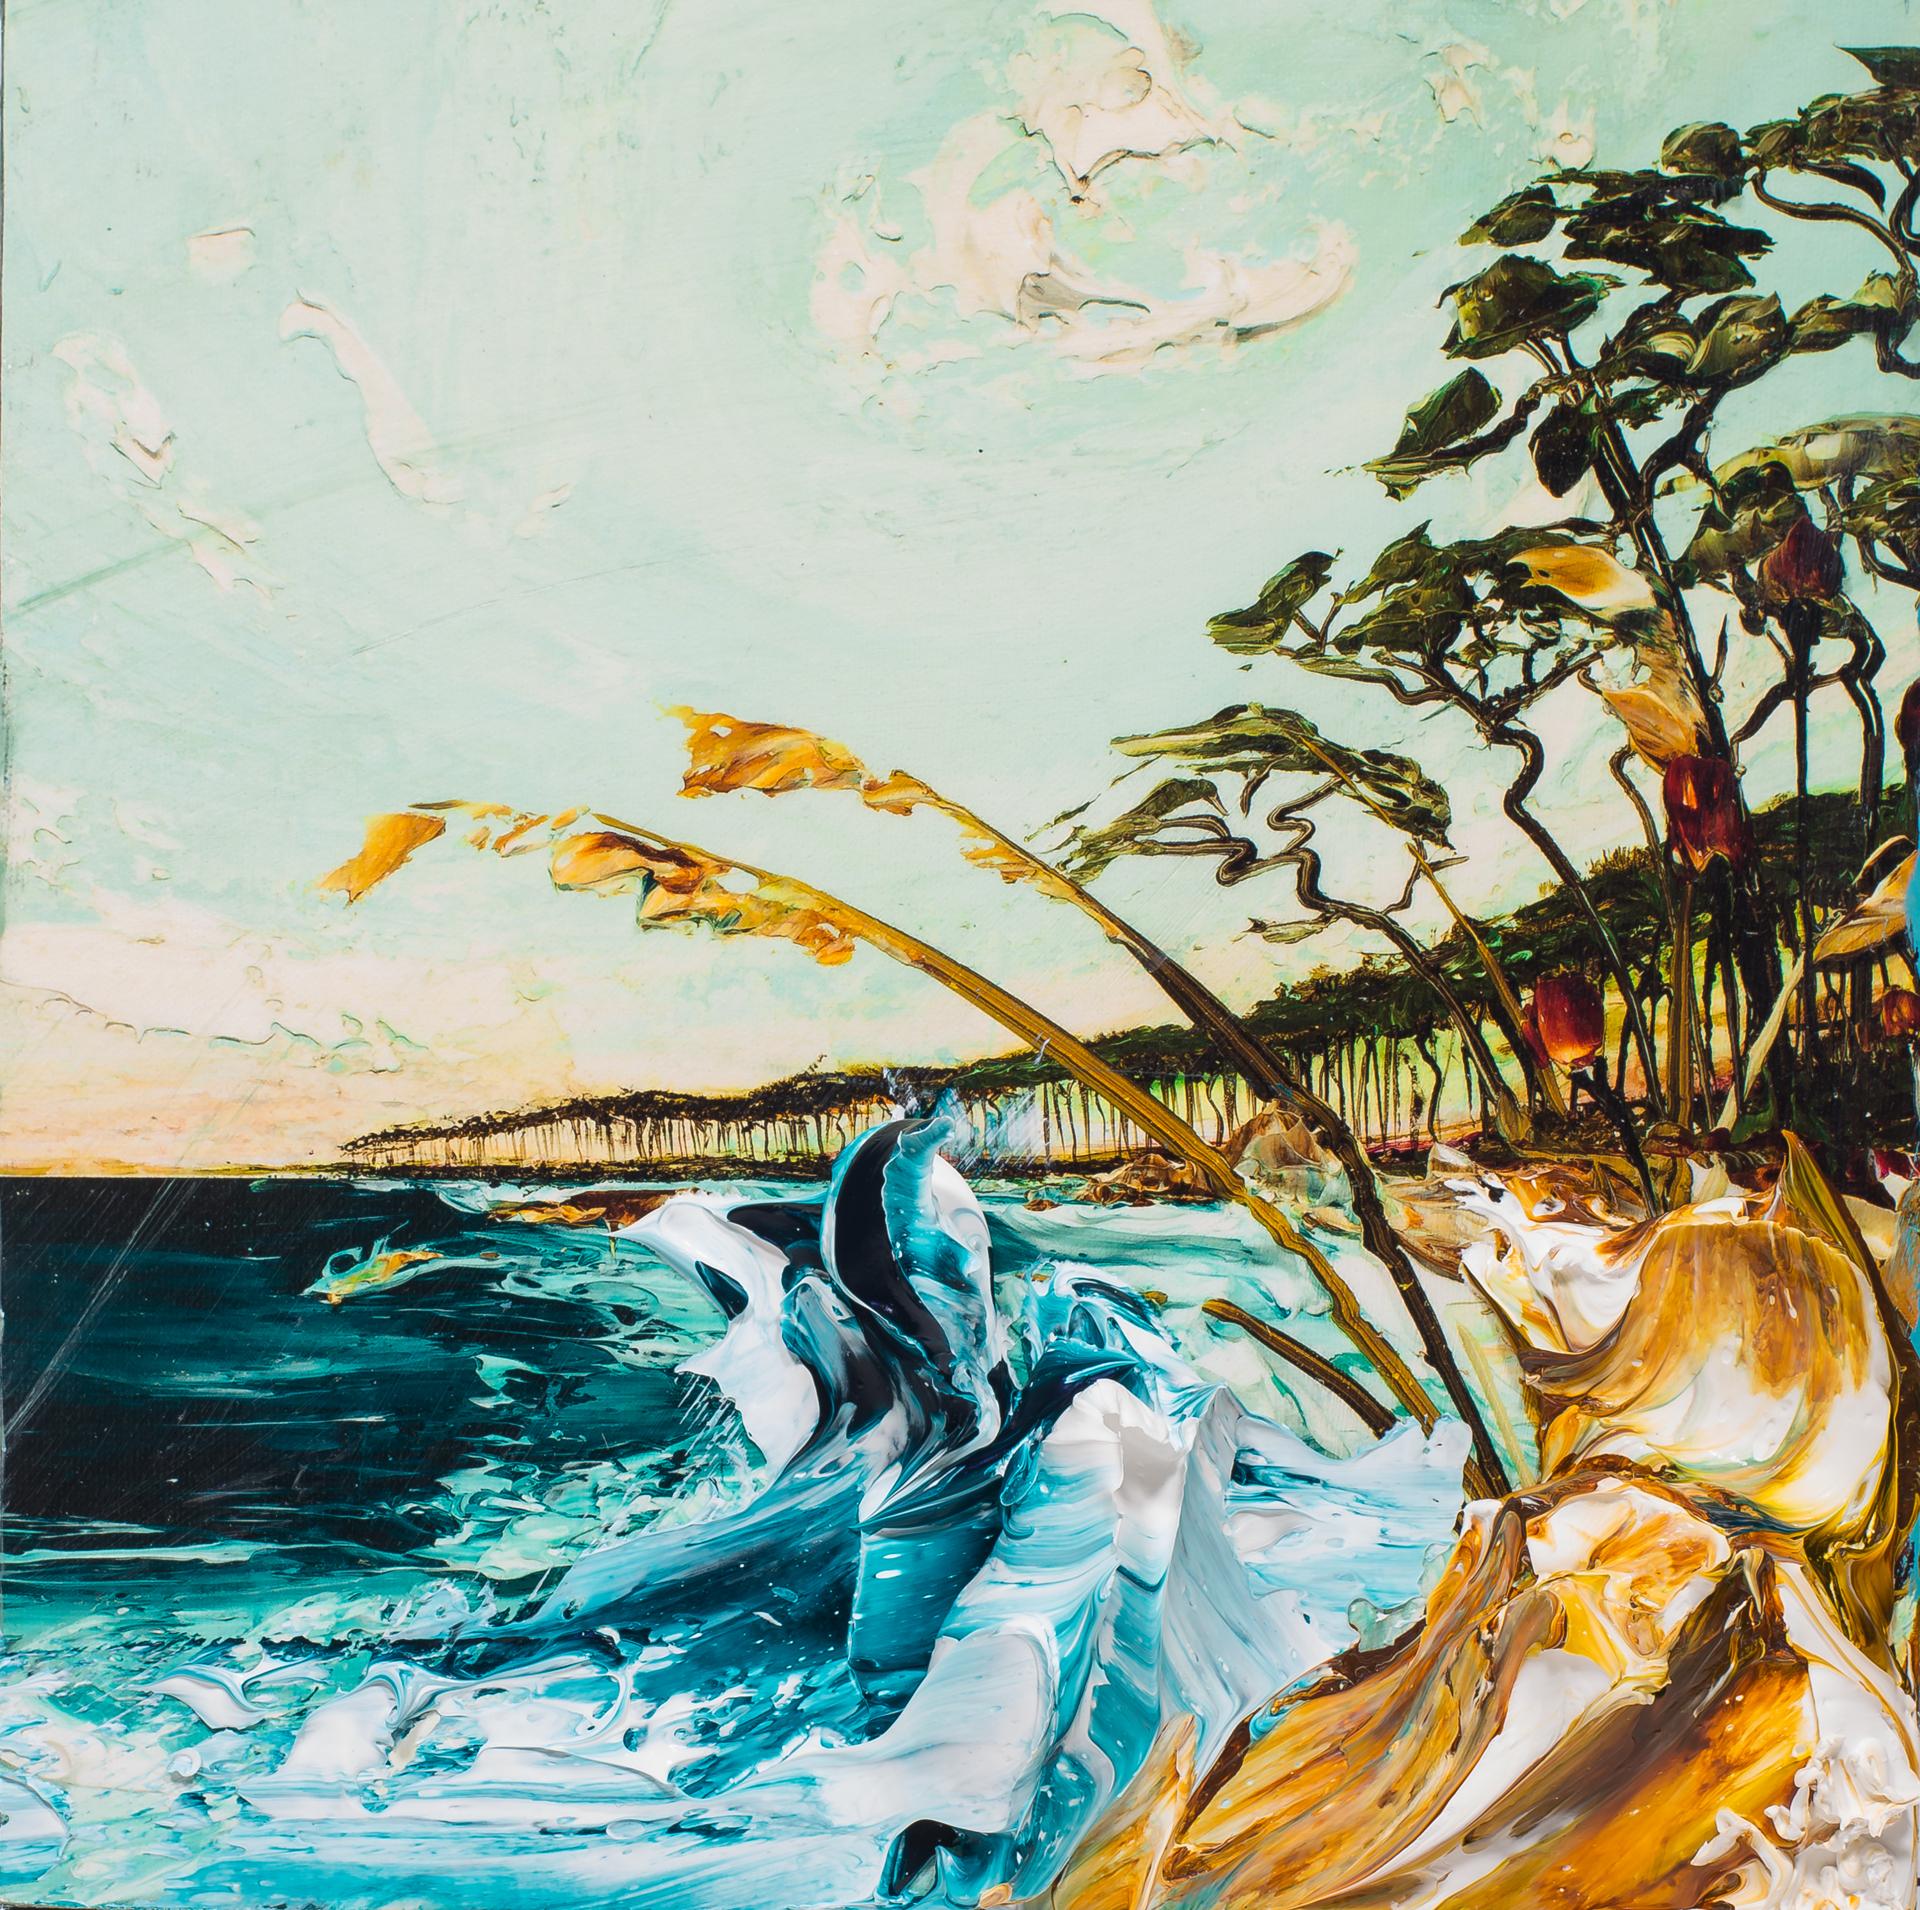 SEASCAPE HPAE 29/50 by Justin Gaffrey